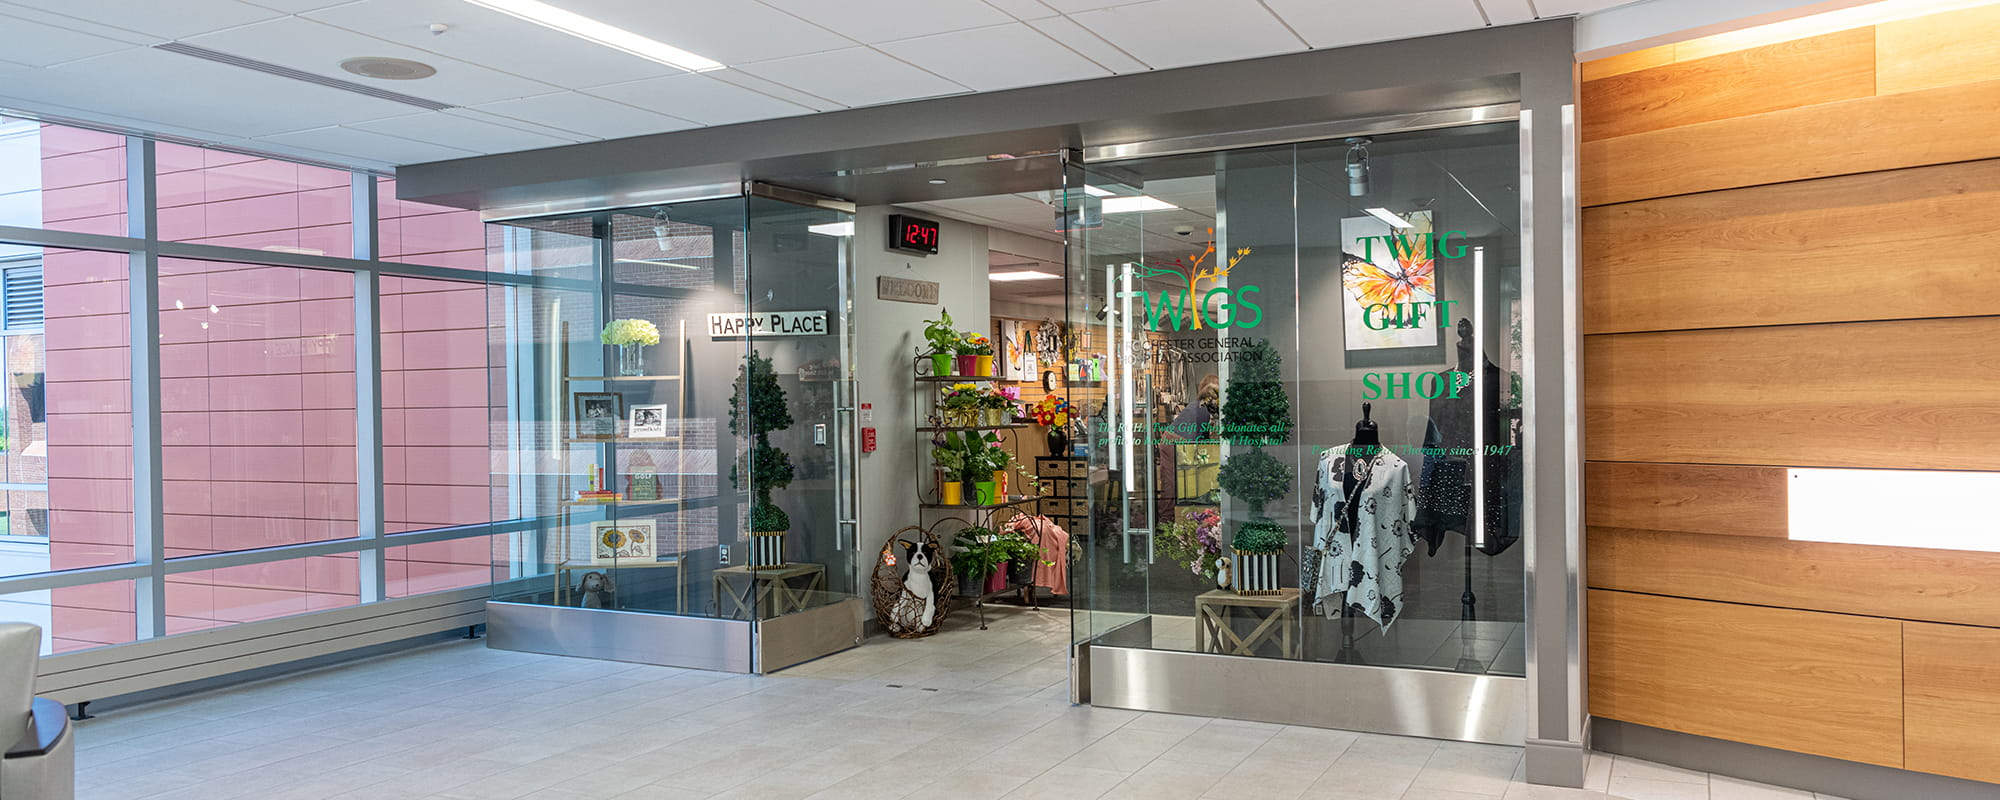 TWIG Gift Shop